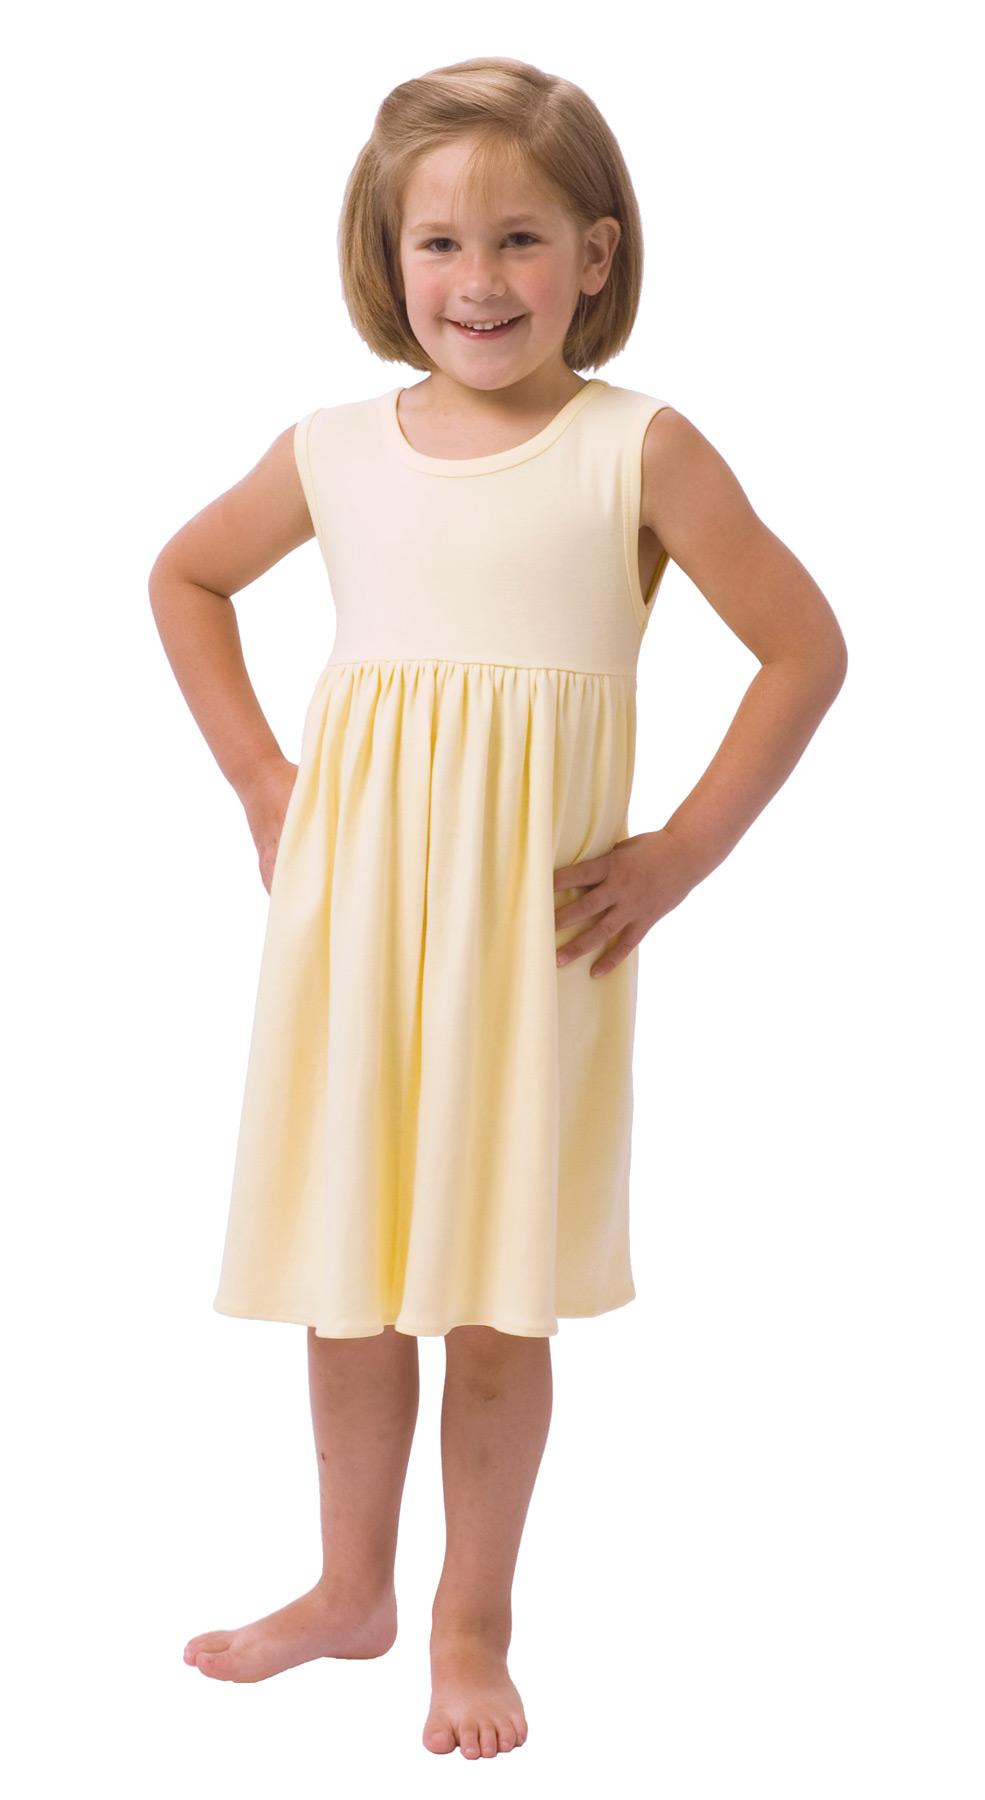 Monag 400114 - Interlock Sleeveless Empire Dress